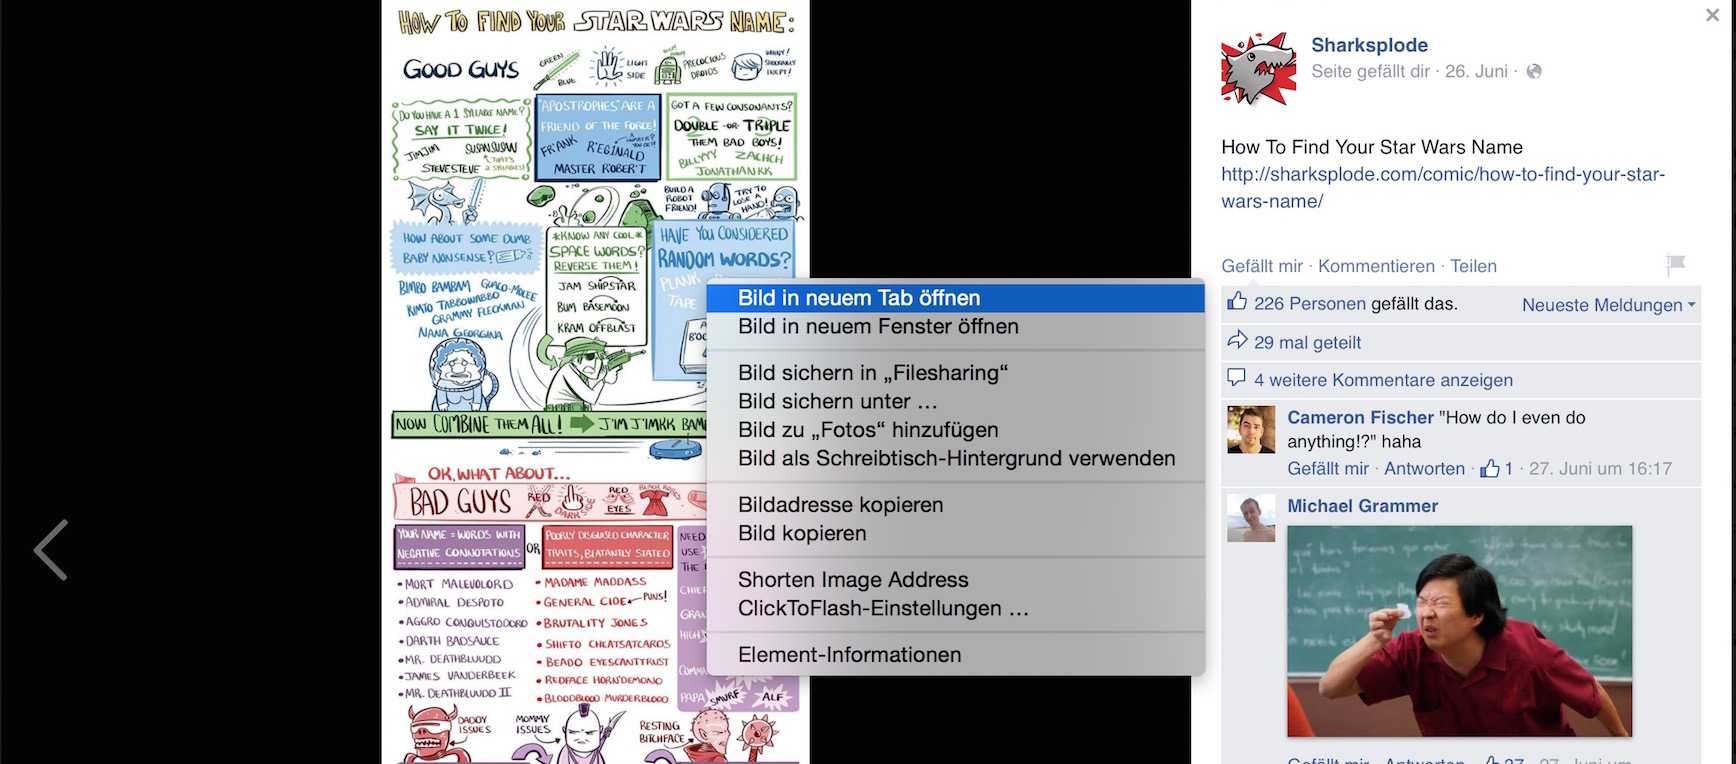 Facebookbild